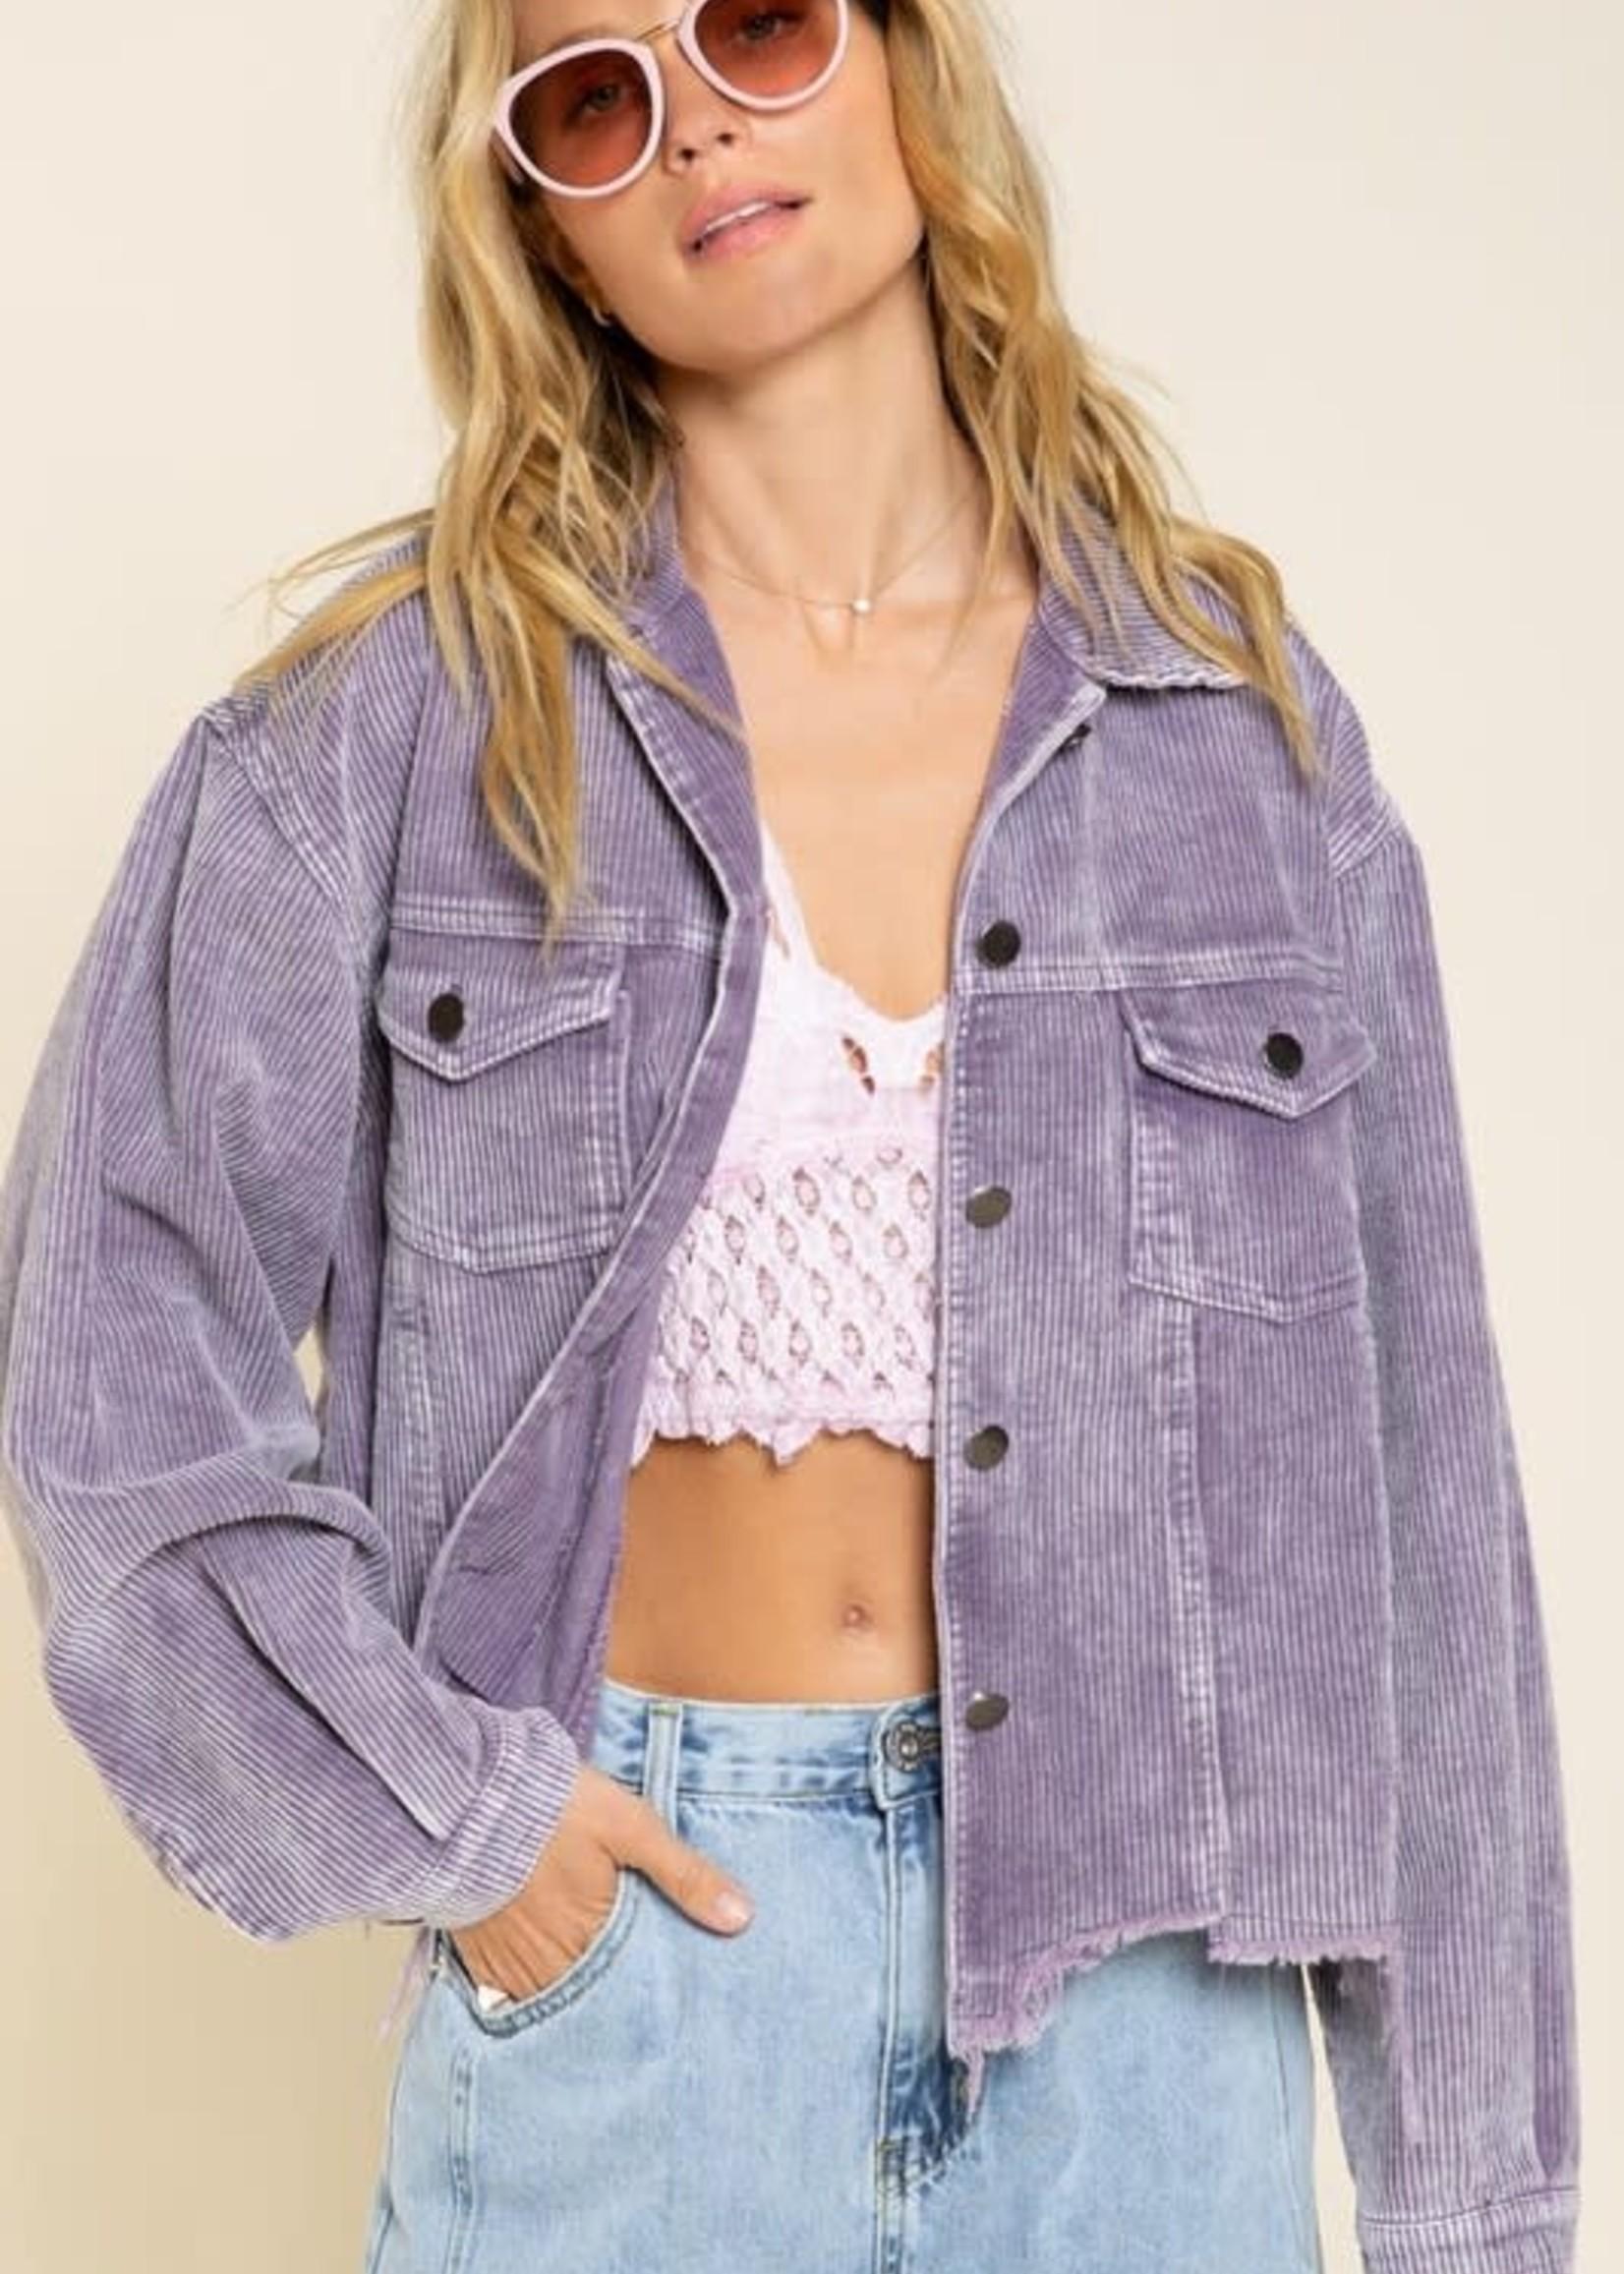 Call It A Day Purple Corduroy Jacket